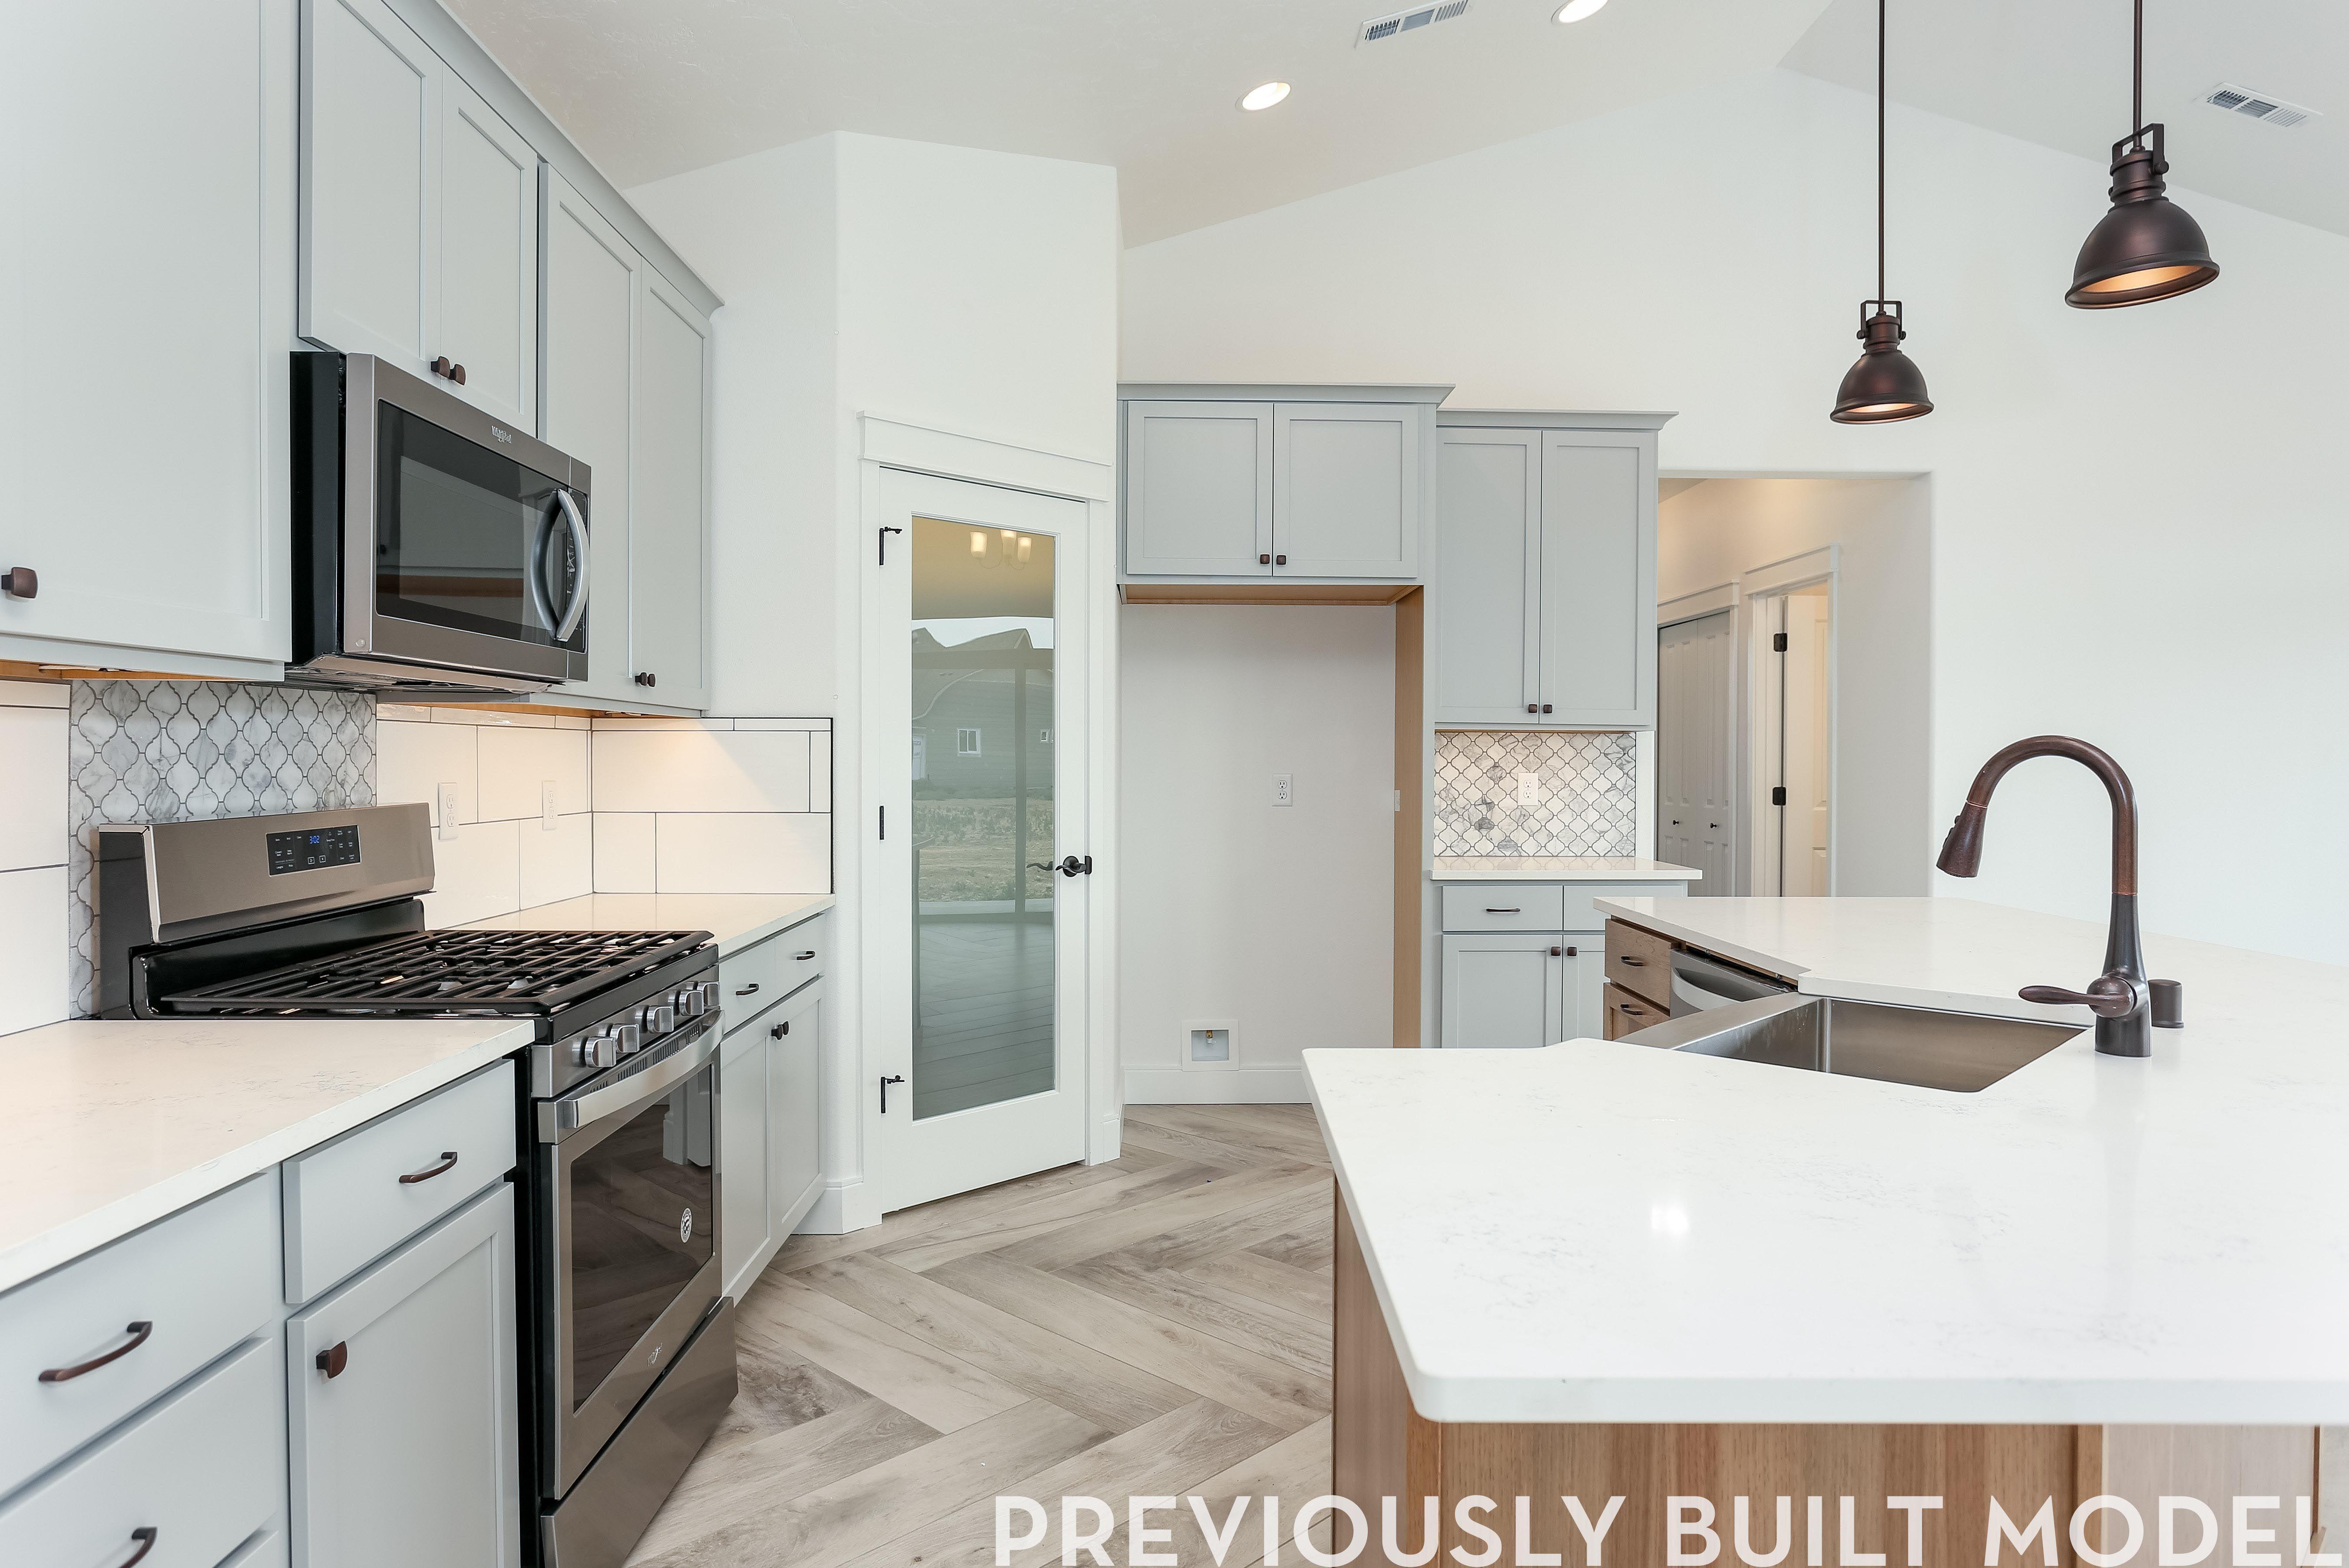 Kitchen featured in The Victoria Bonus By RYN Built Homes in Spokane-Couer d Alene, WA